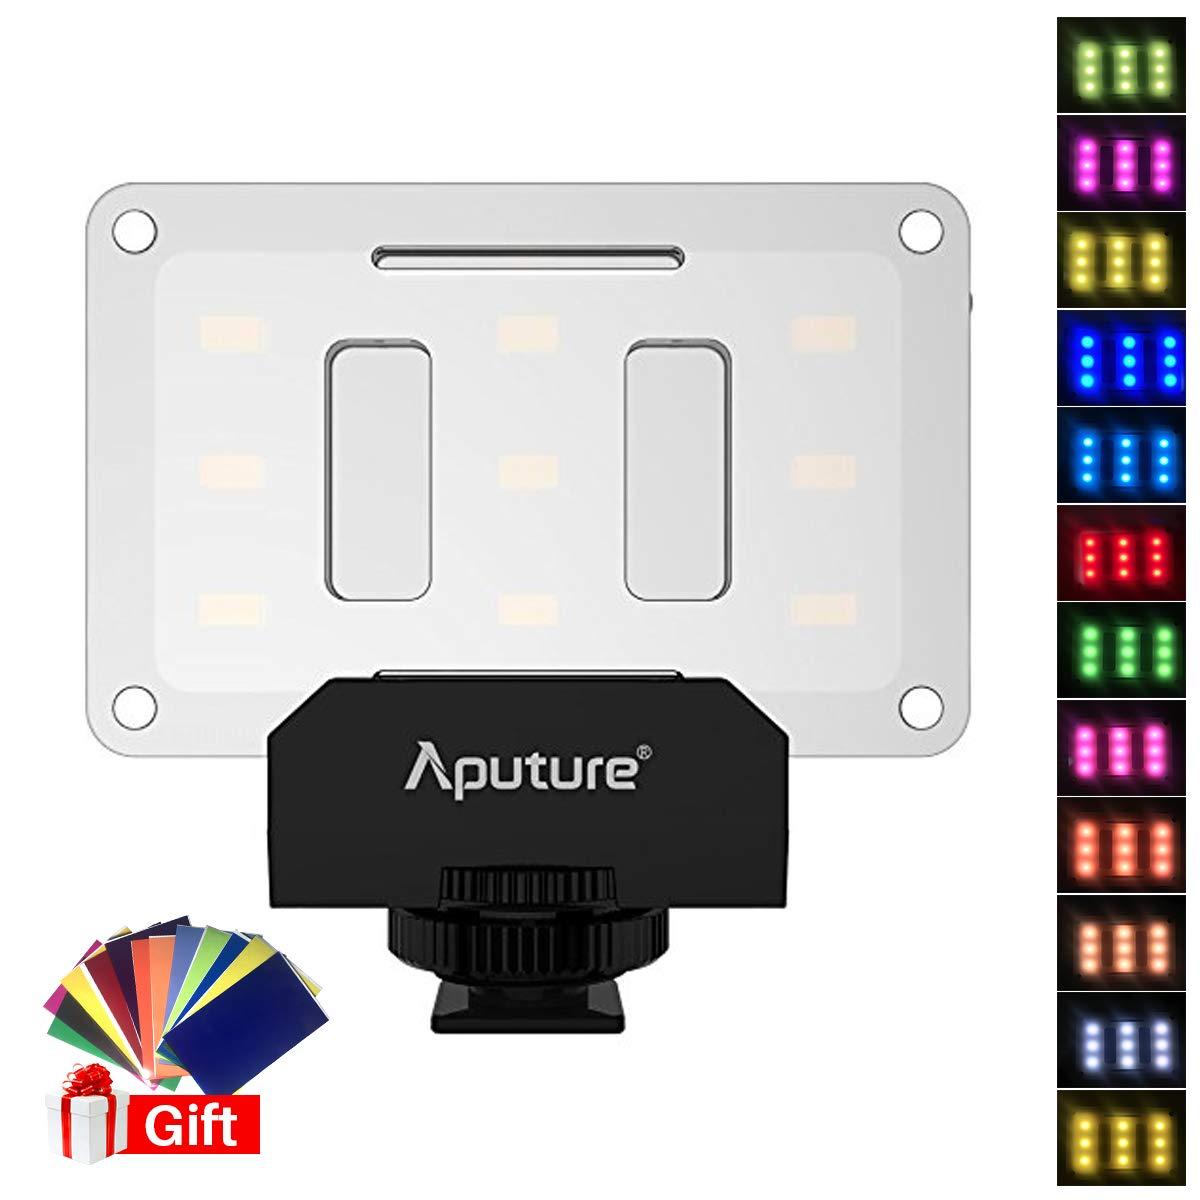 Aputure AL-M9 w Free 12 Transparent Color Filter, Amaran LED Mini Light on Camera Video Light by Aputure